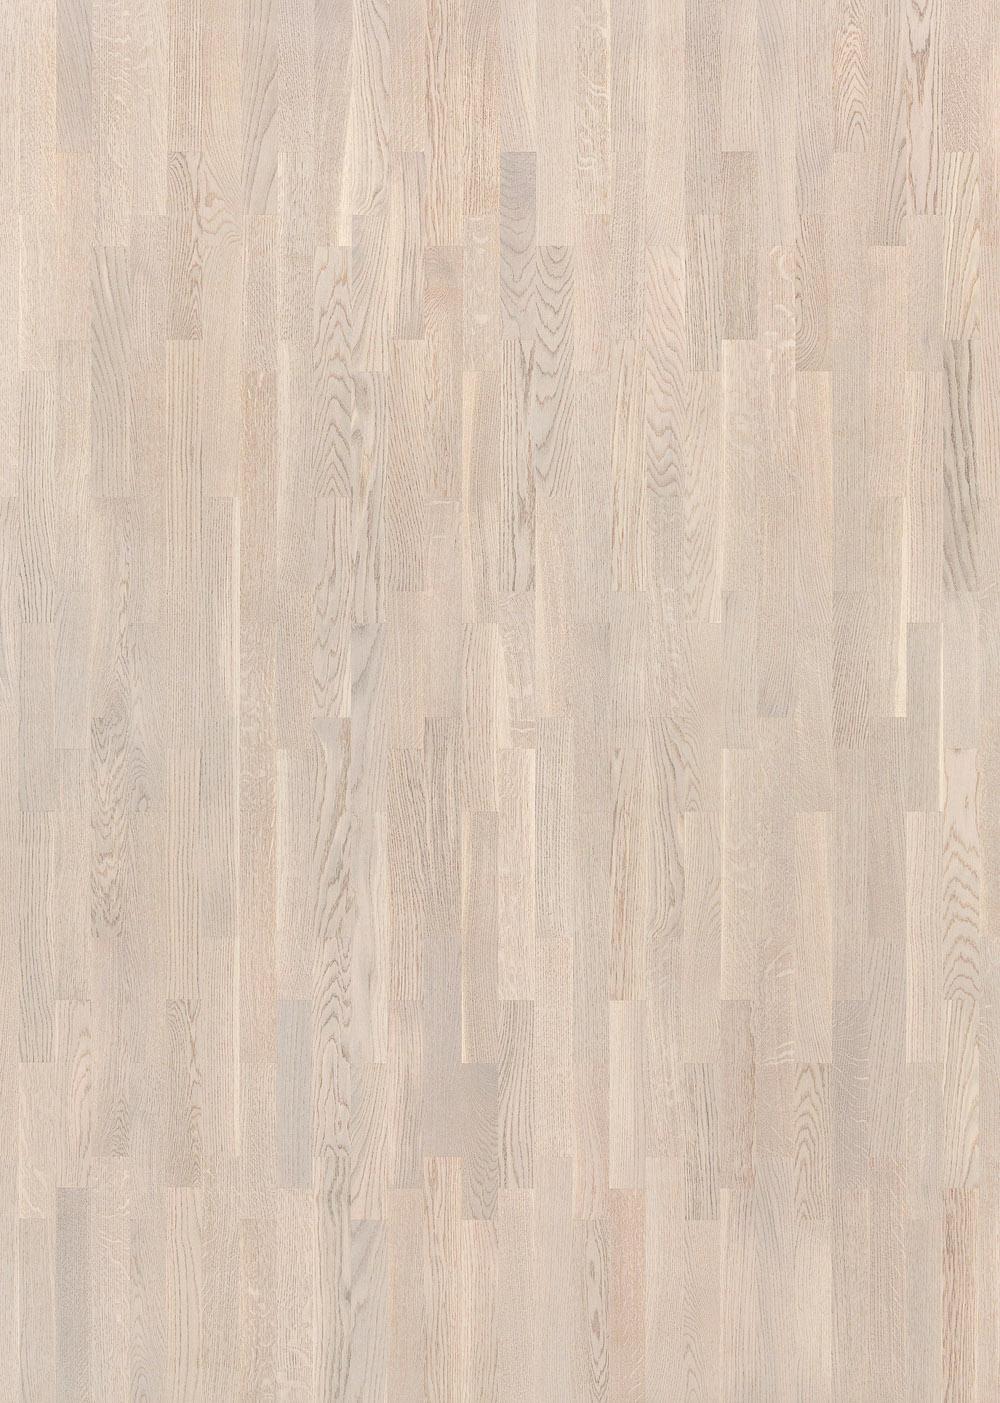 SALSA OAK NORDIC WHITE - 550049072